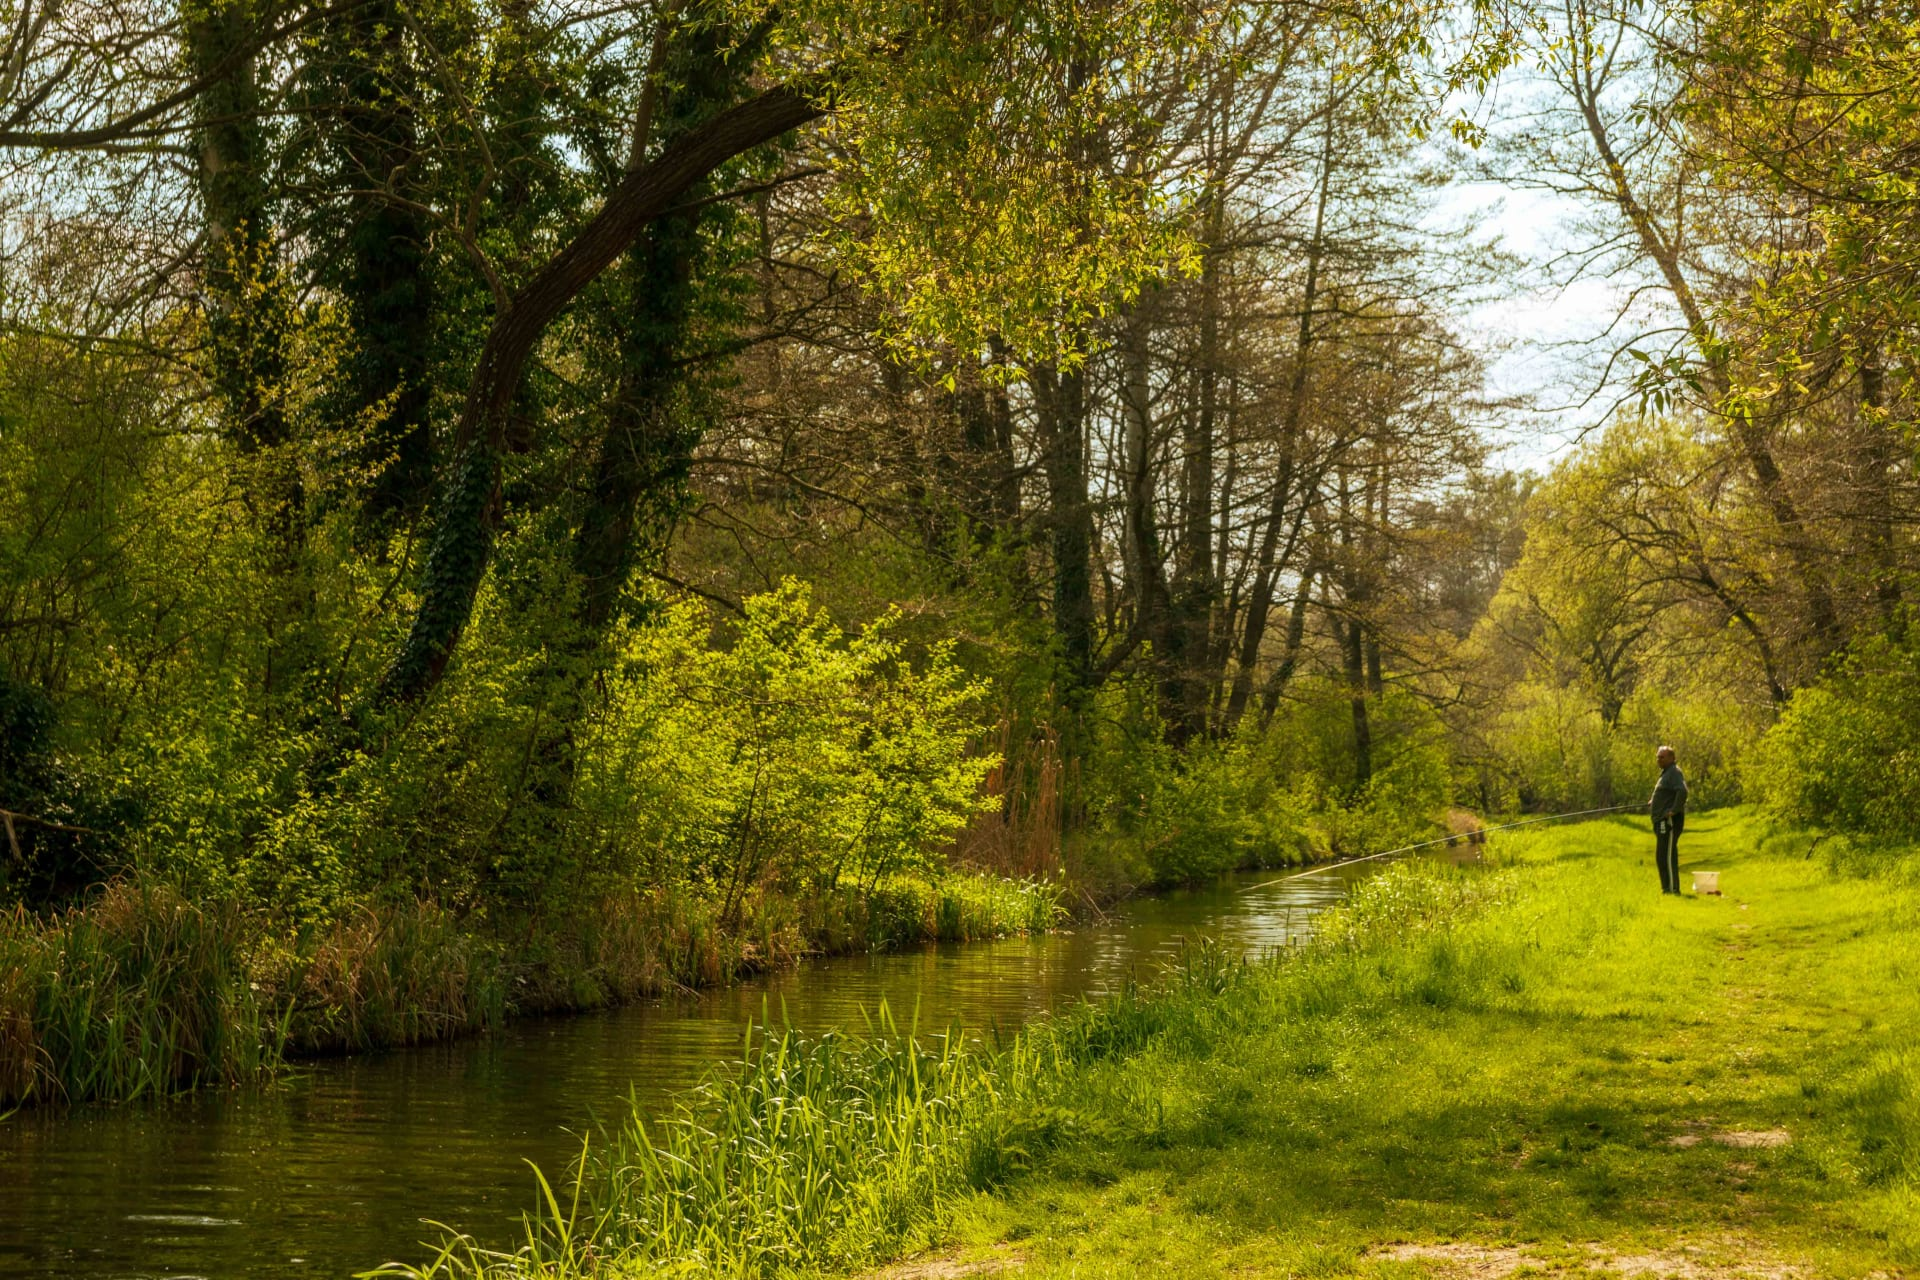 Környe - Cycling Tour in the Hungarian Countryside - The Lake District of Tatabanya basin